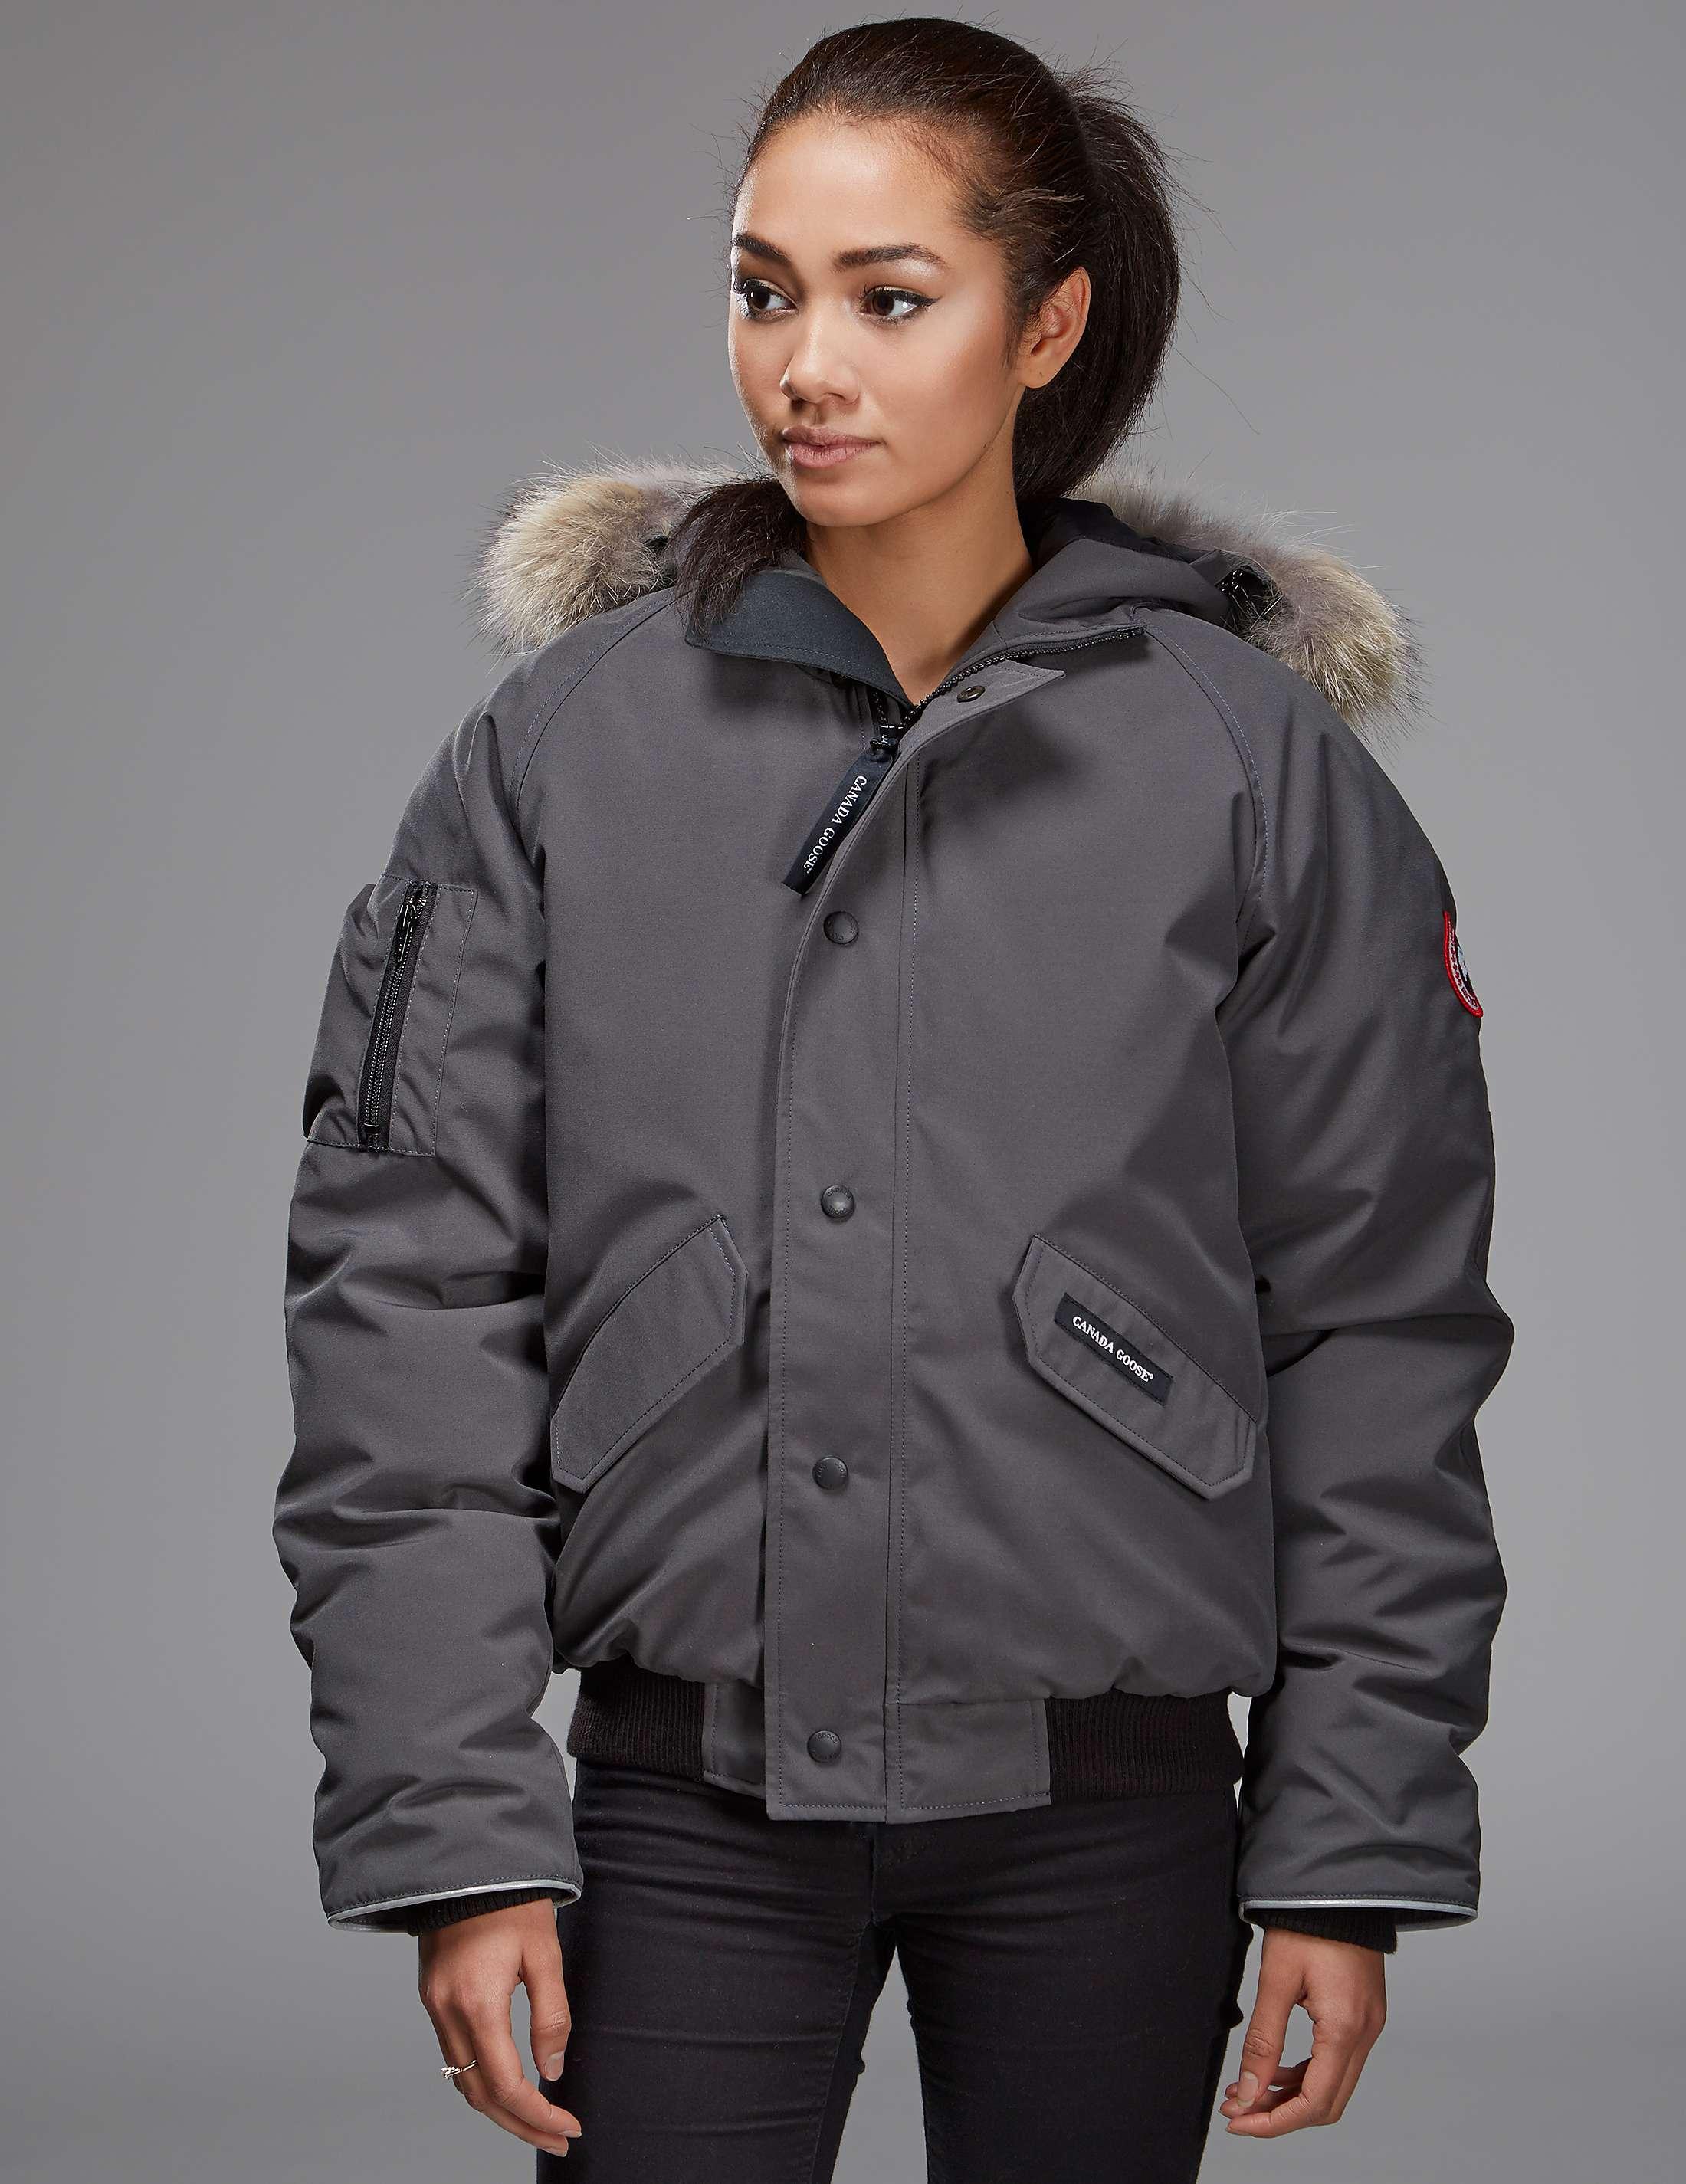 Canada Goose chilliwack parka online discounts - Jackets Kids | Tessuti